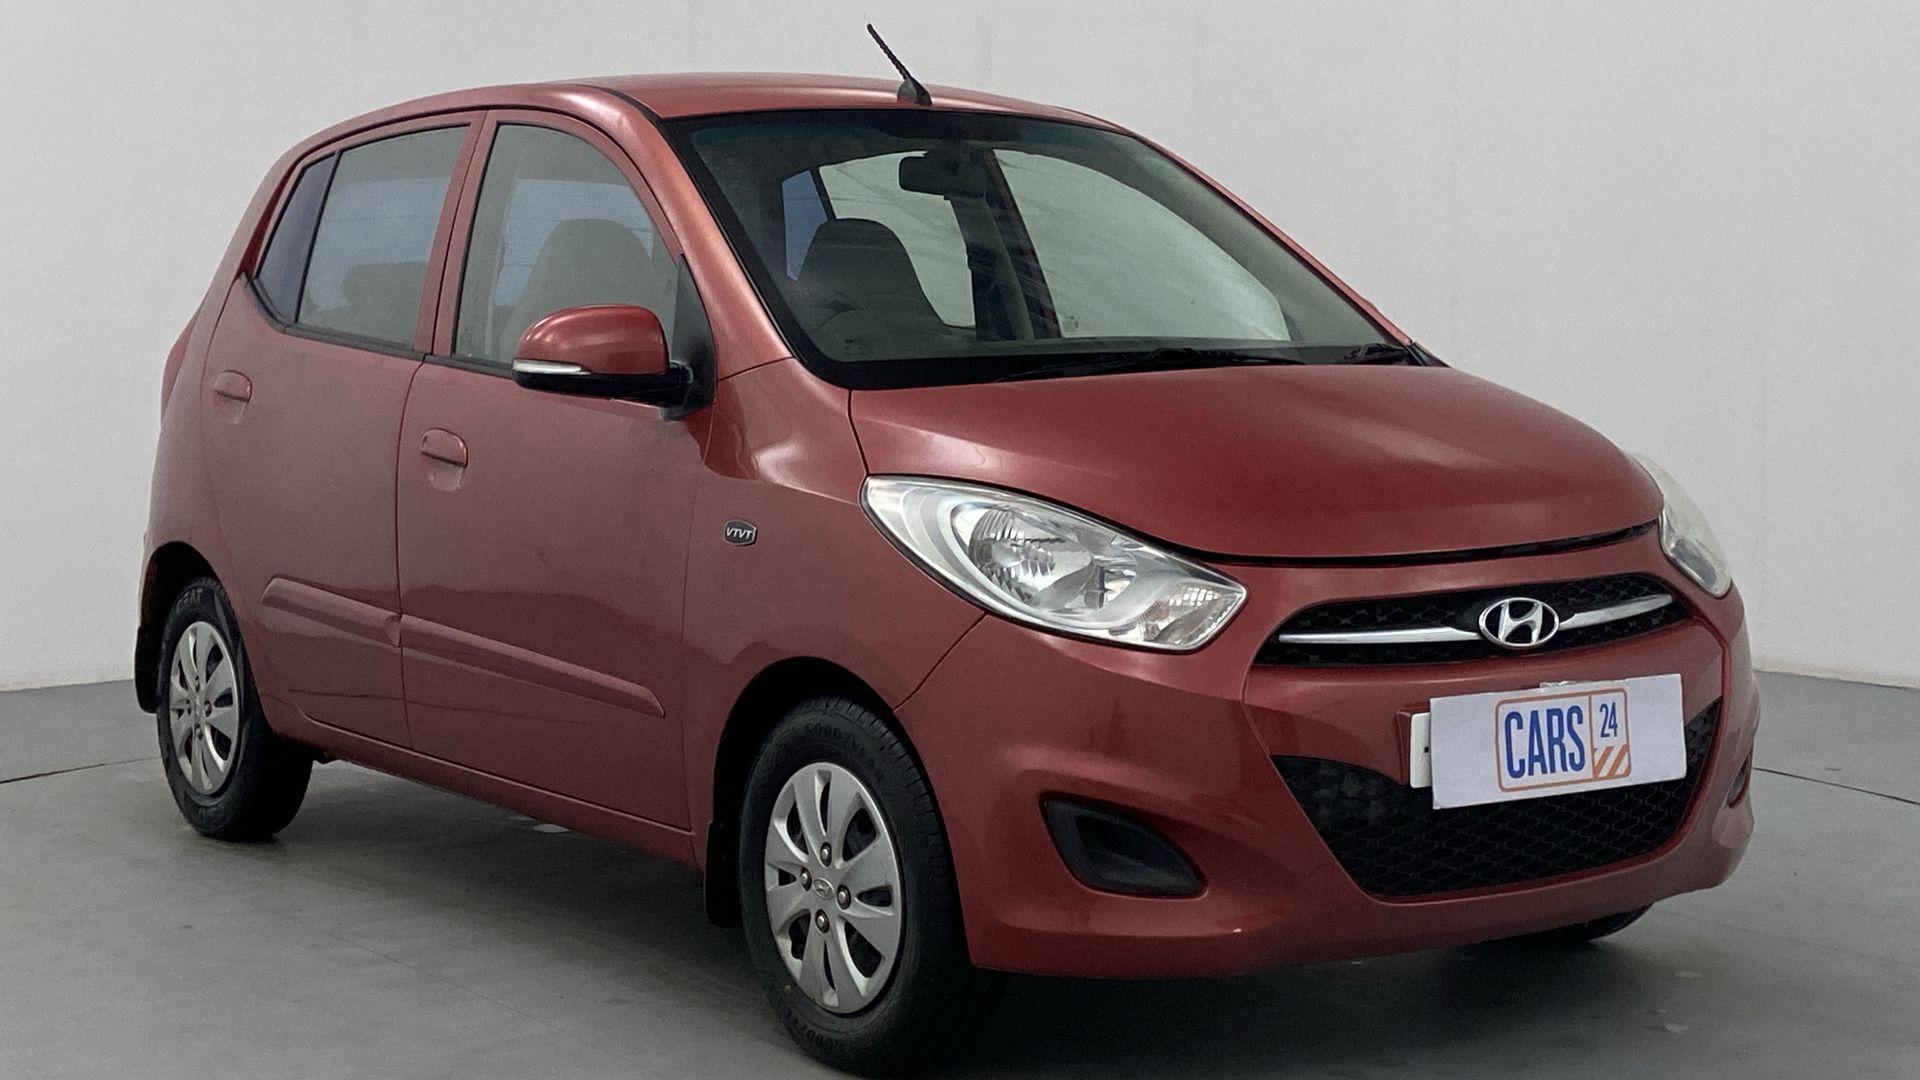 2011 Hyundai i10 SPORTZ 1.2 KAPPA2